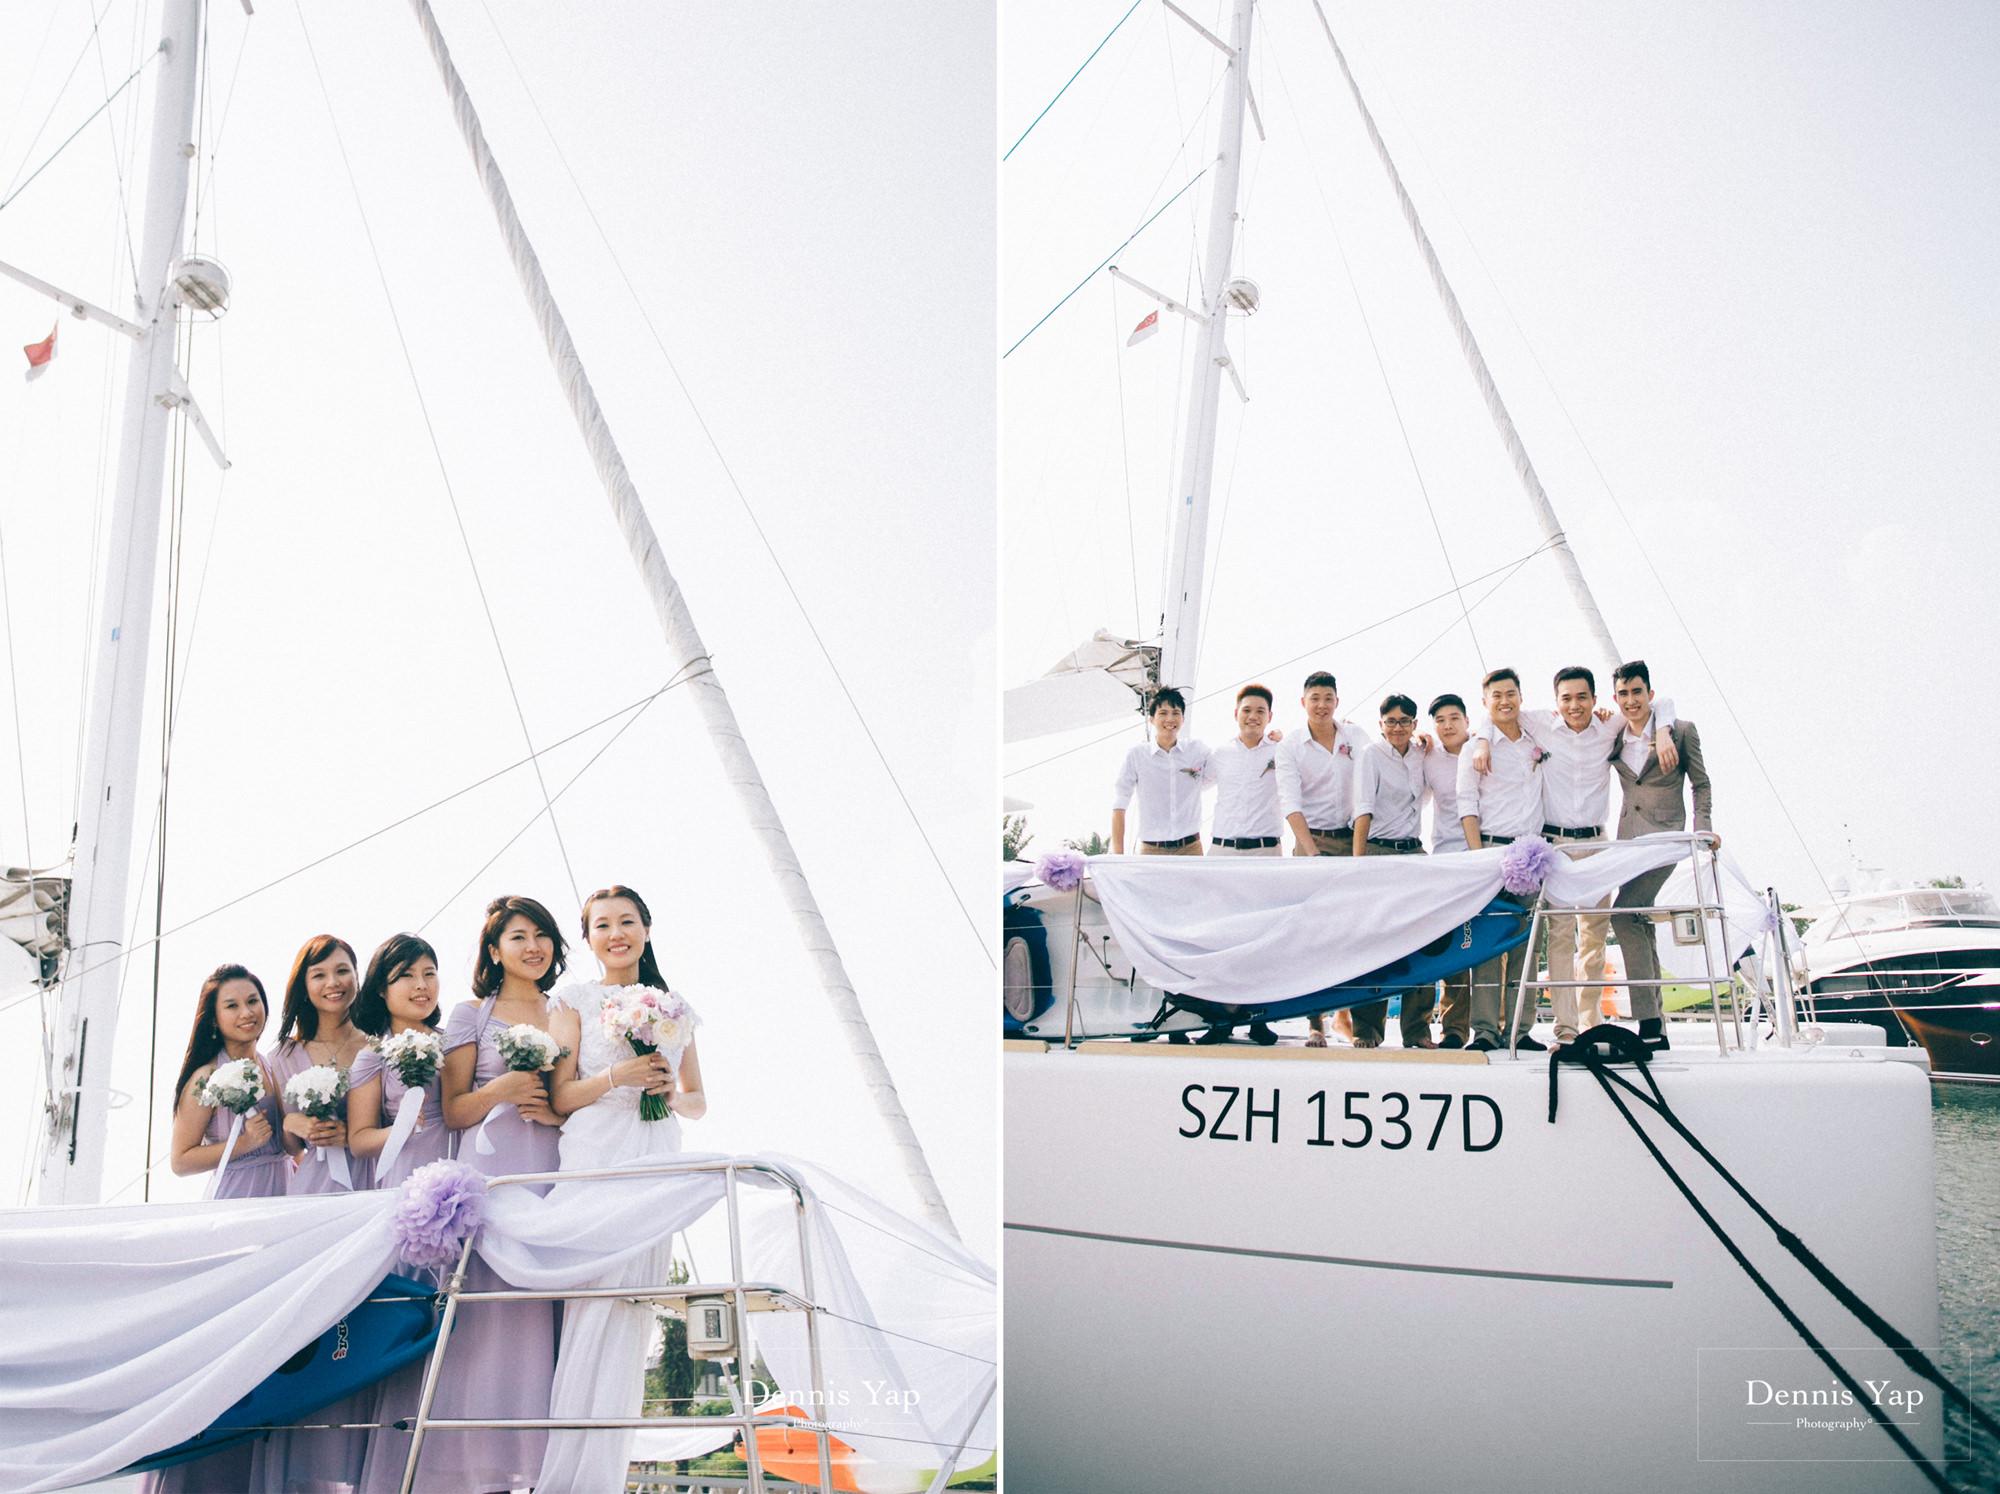 danny sherine wedding reception registration of marriage yacht fun beloved sea dennis yap photography malaysia top wedding photographer-23.jpg